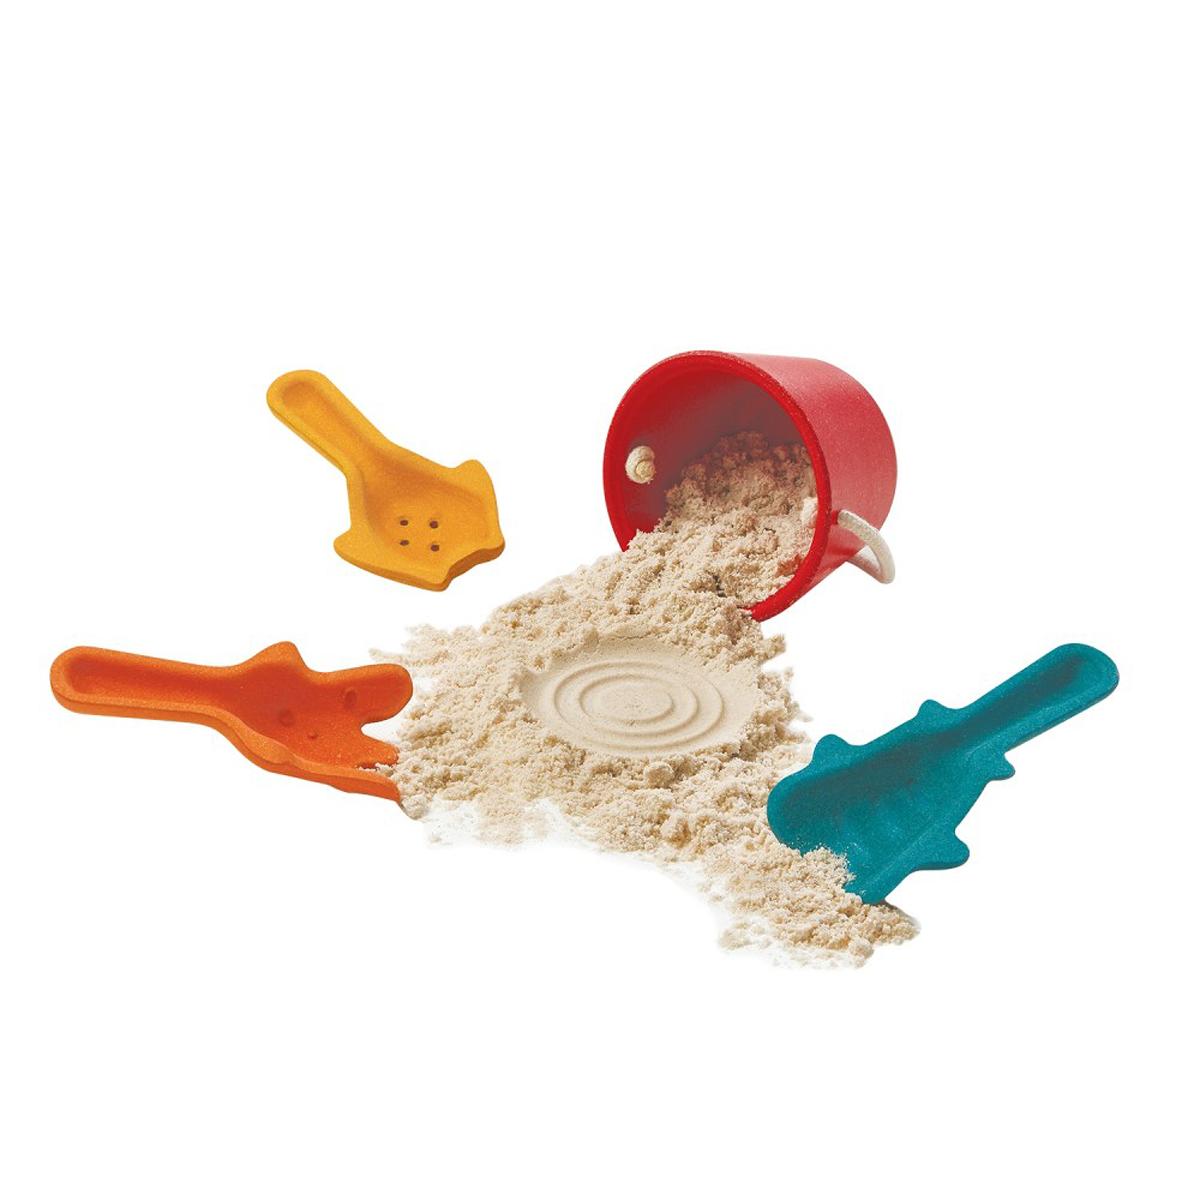 Sand Play Set Plan Toys